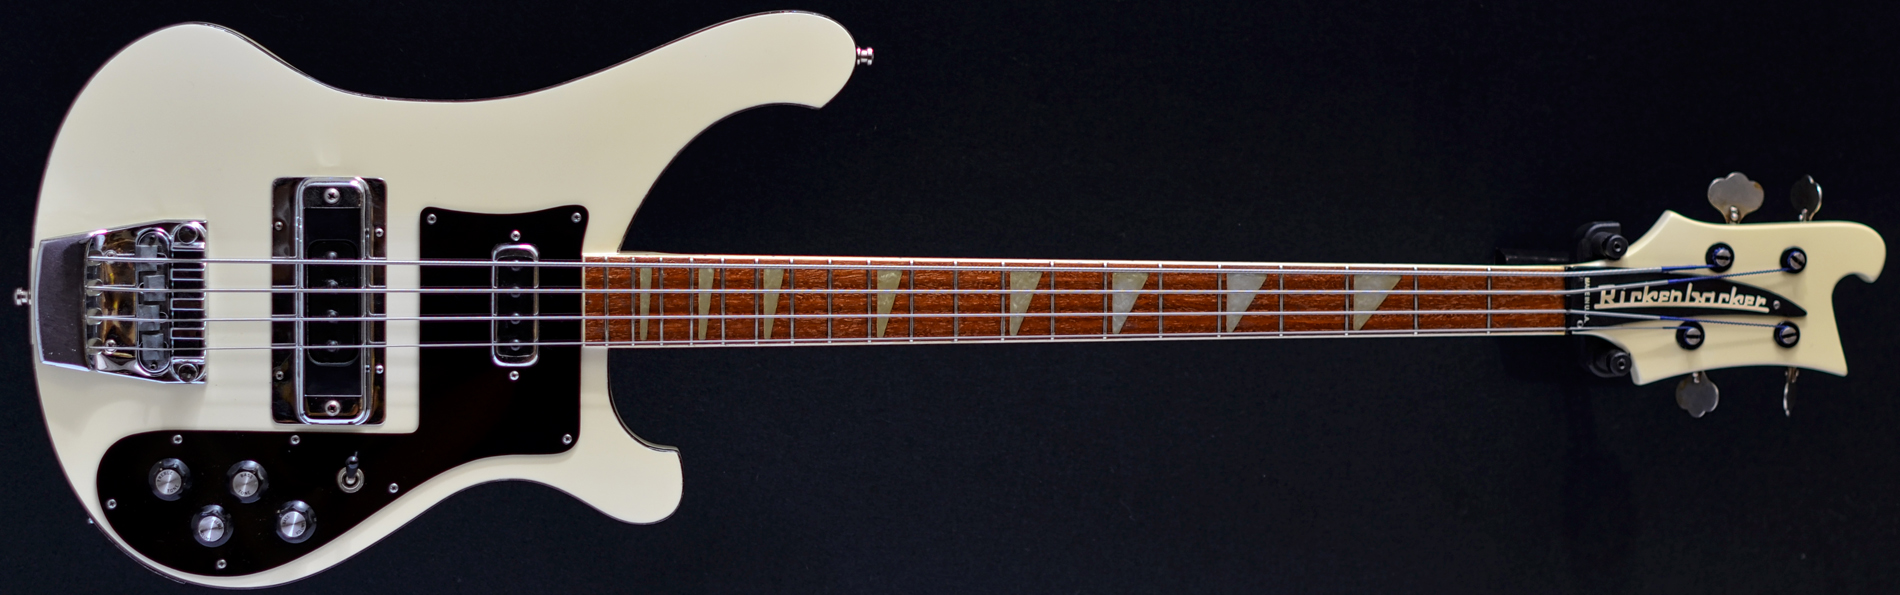 Rickenbacker 4001 bass, 1982  white, Second Hand and Ex-demo